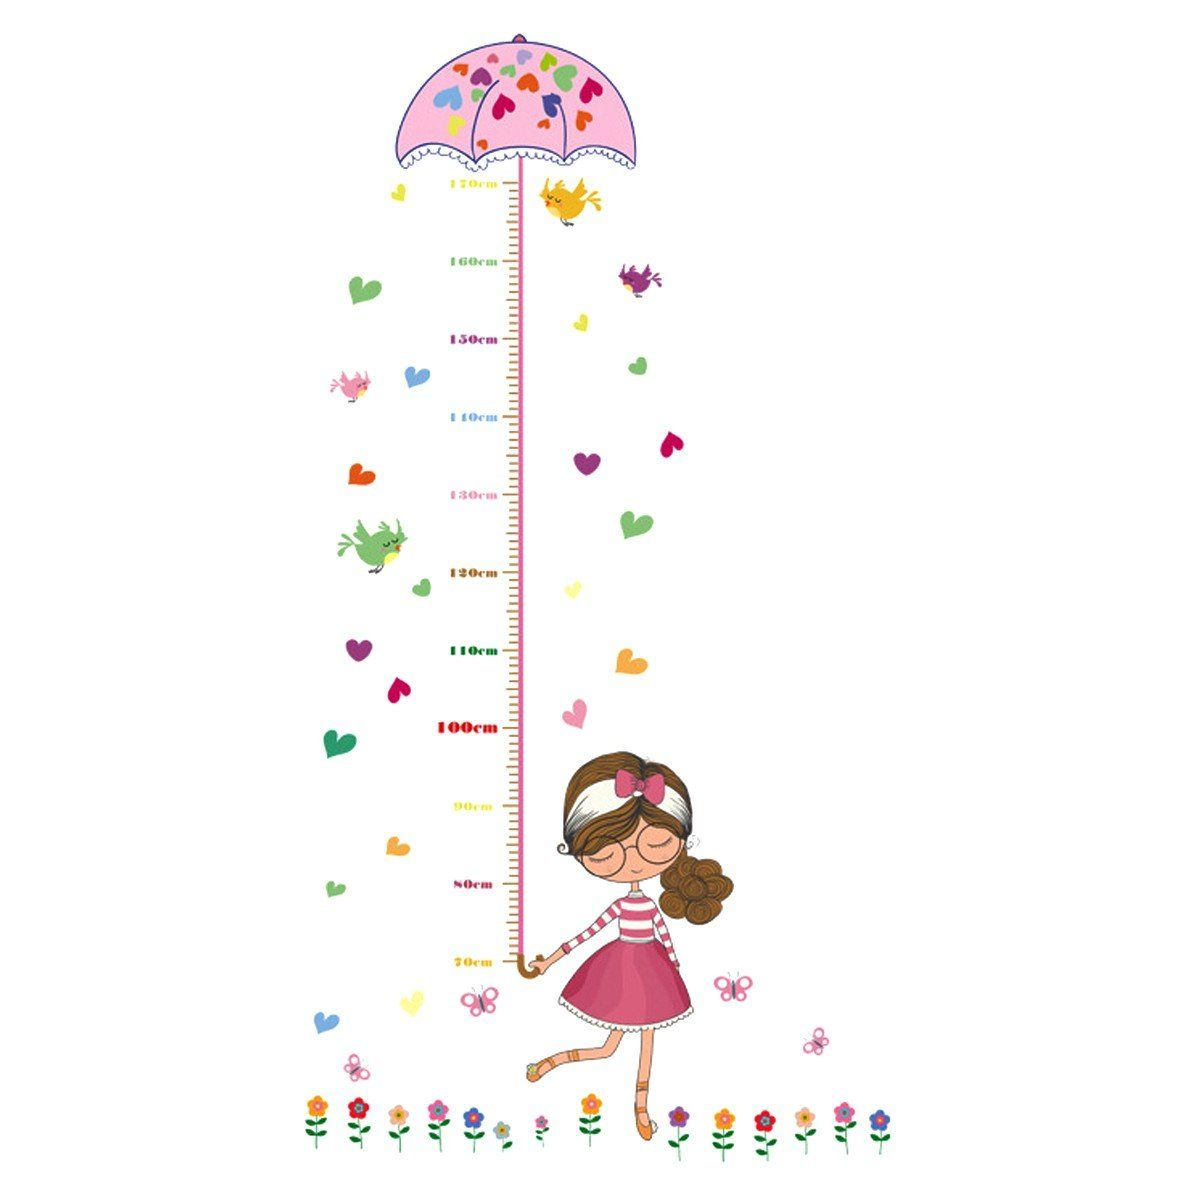 Uniquebella pvc height measurement growth chart for child kid uniquebella pvc height measurement growth chart for child kid removable nursery wall art decals stickers cartoon nvjuhfo Images